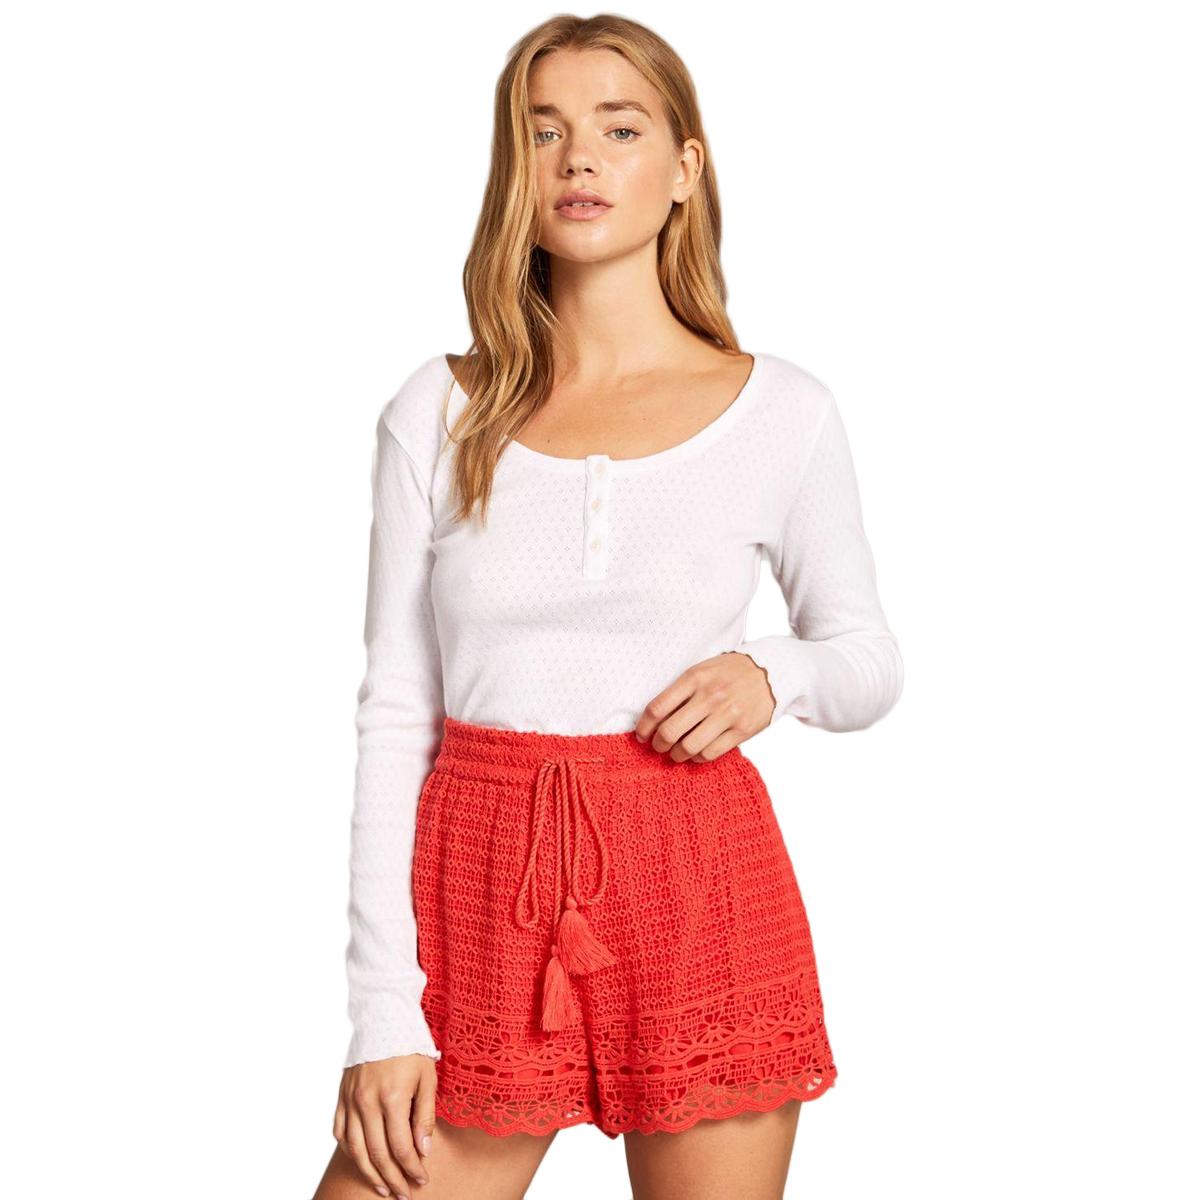 Jack Wills Women's Henriette Crochet Shorts - Red, 6